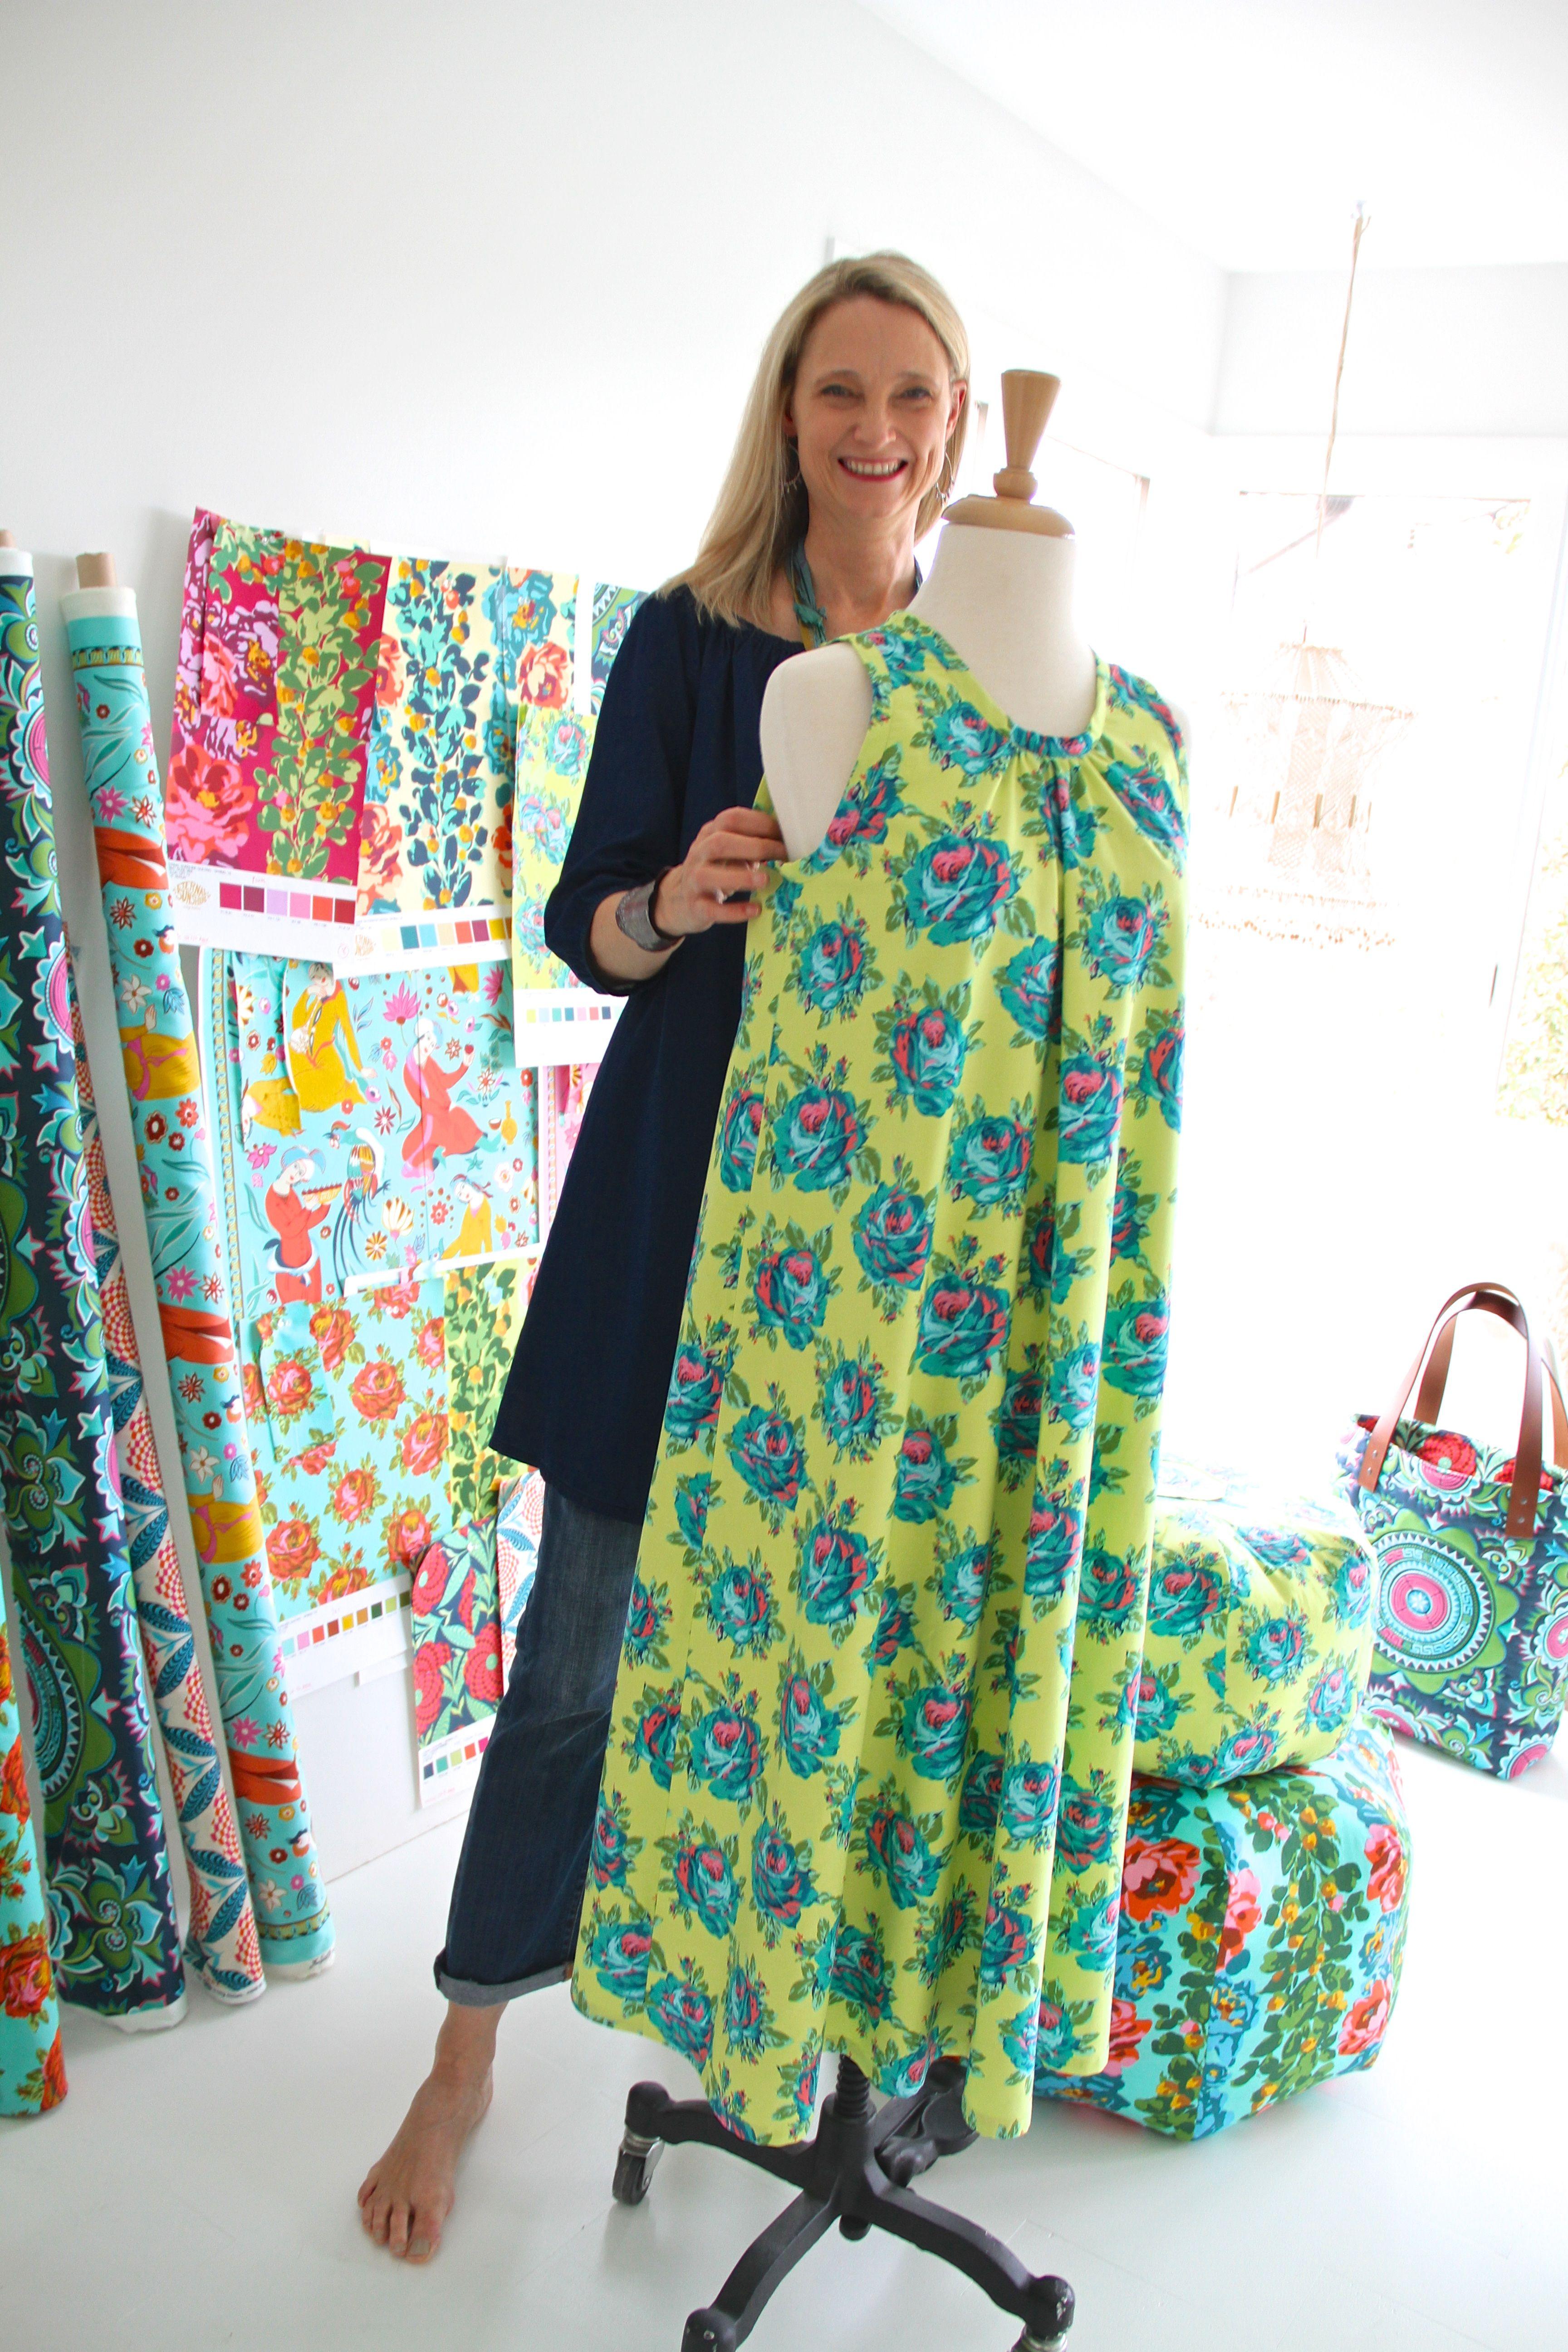 The Kiomi Dress By Lotta Jansdotter In My Eternal Sunshine